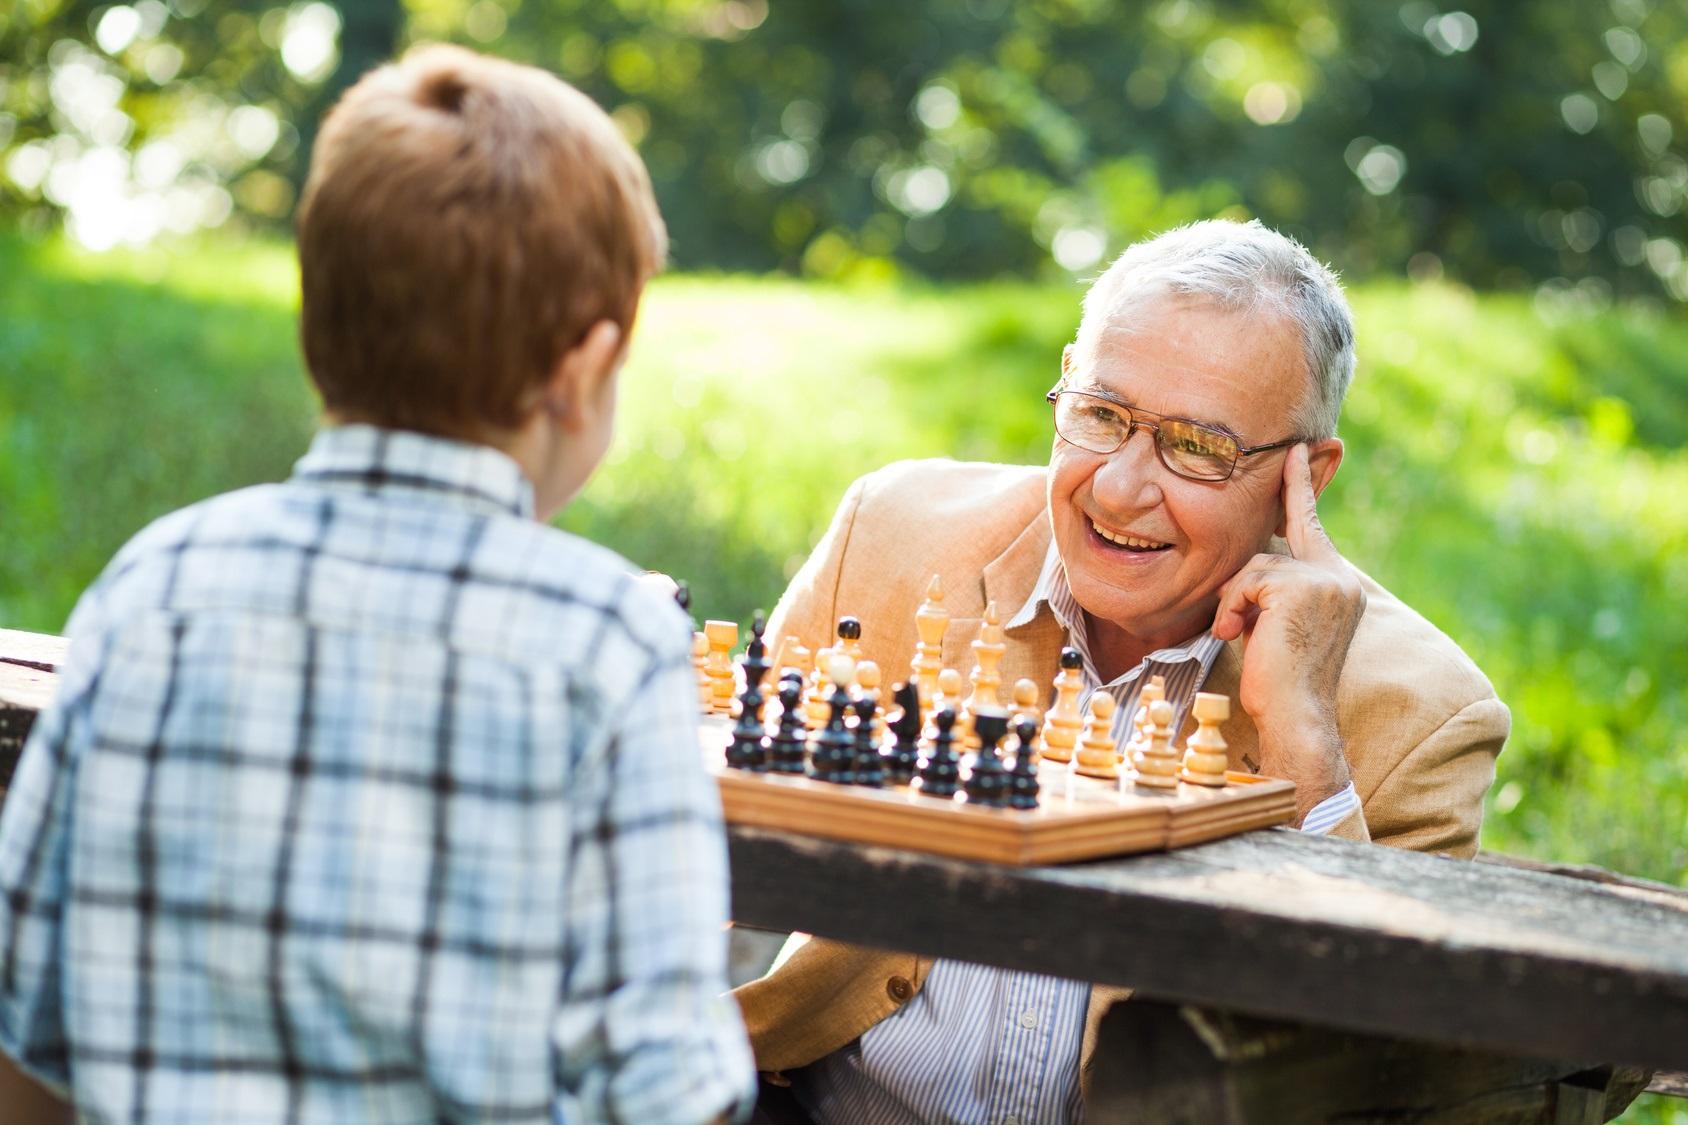 Abuelo y nieto jugando al ajedrez